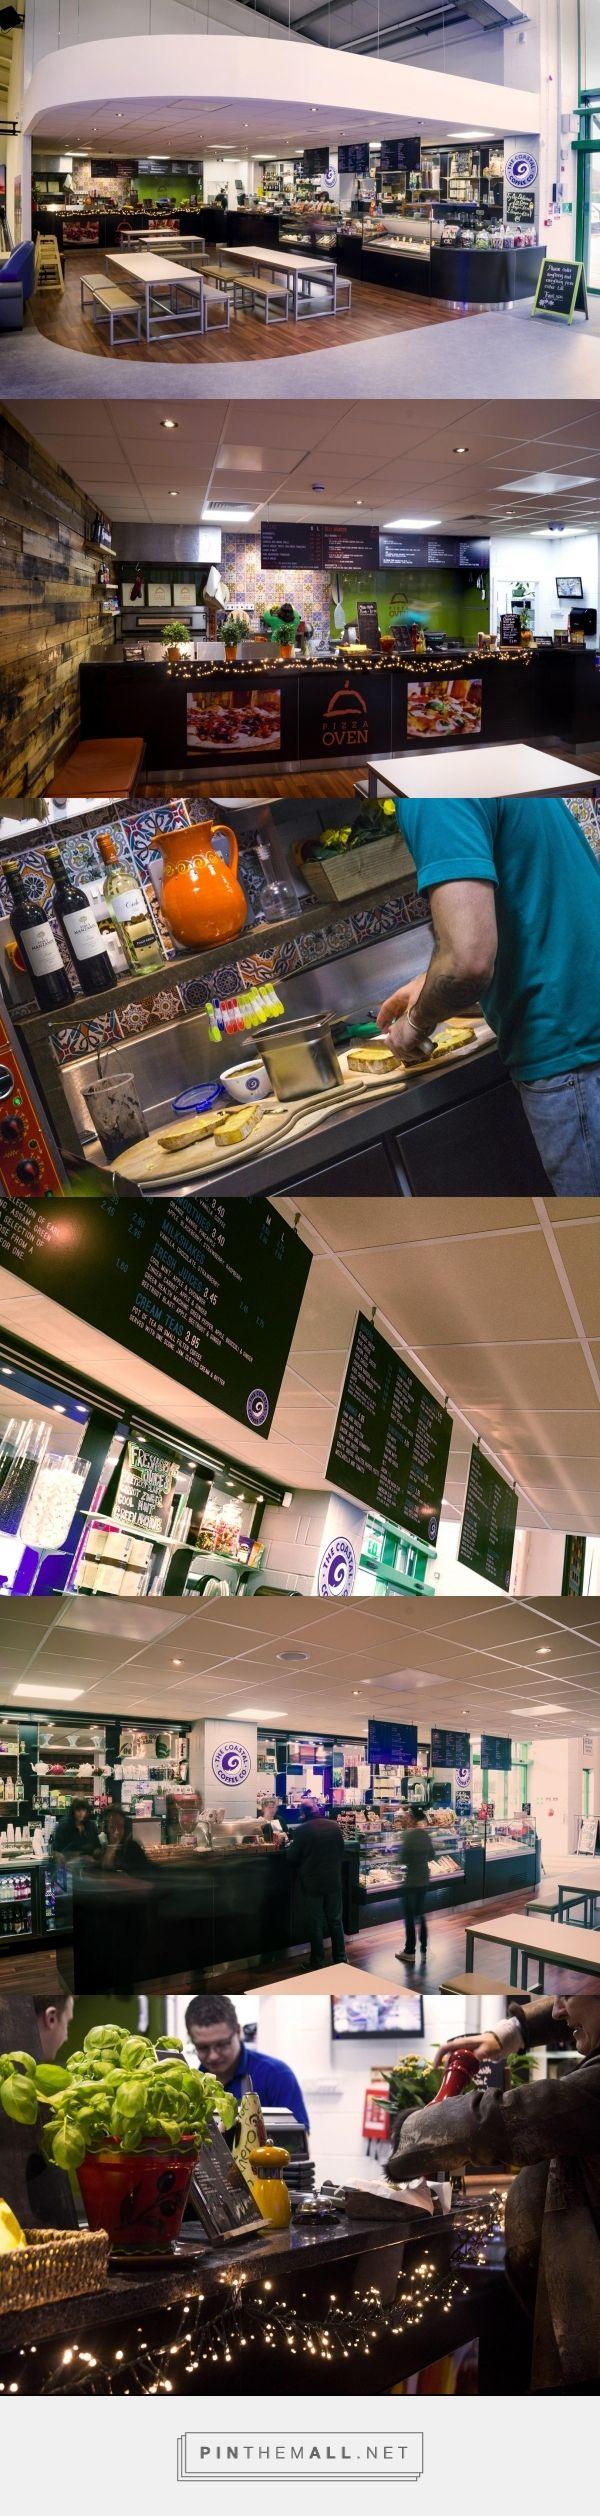 #CoffeeShop #InteriorDesign #MediterraneanTiles #ArtisanCoffee #Gelato #Graphics #ServiceCounter #BarCounter #CoffeeShopDisplays #WallDisplays #CateringEquipment